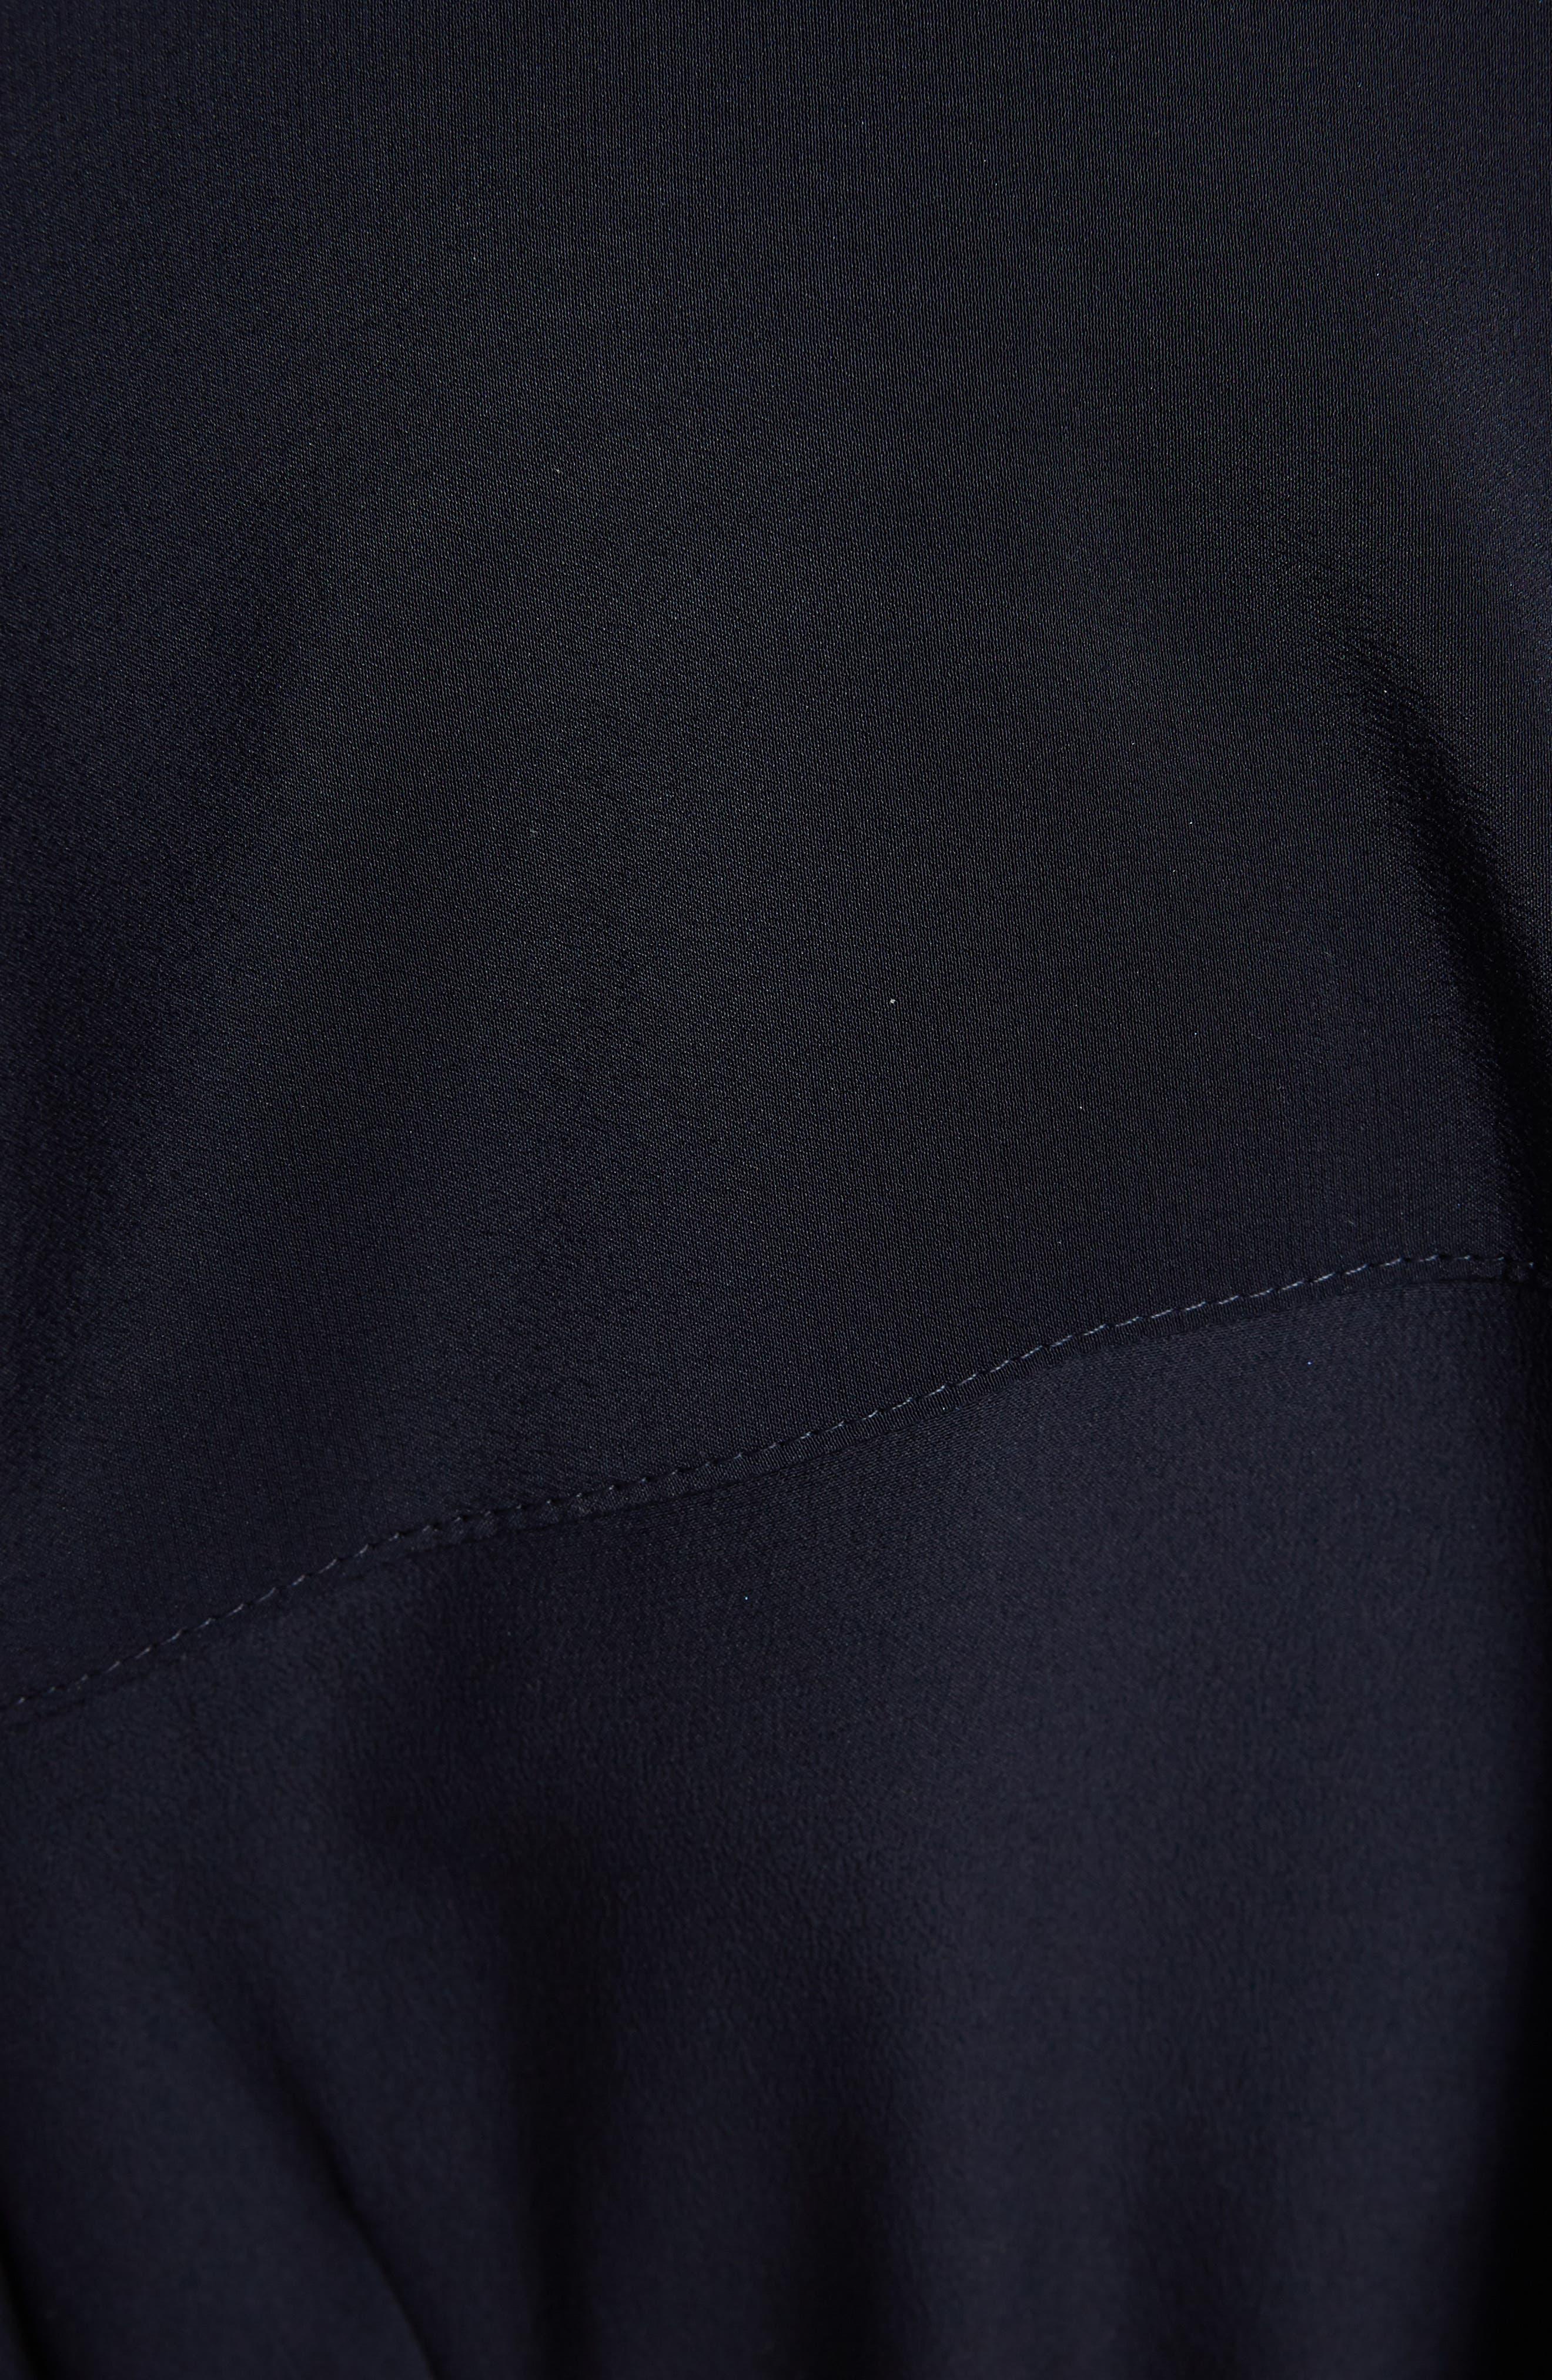 VICTORIA BECKHAM, Belted Silk Shirtdress, Alternate thumbnail 5, color, NAVY/ RED